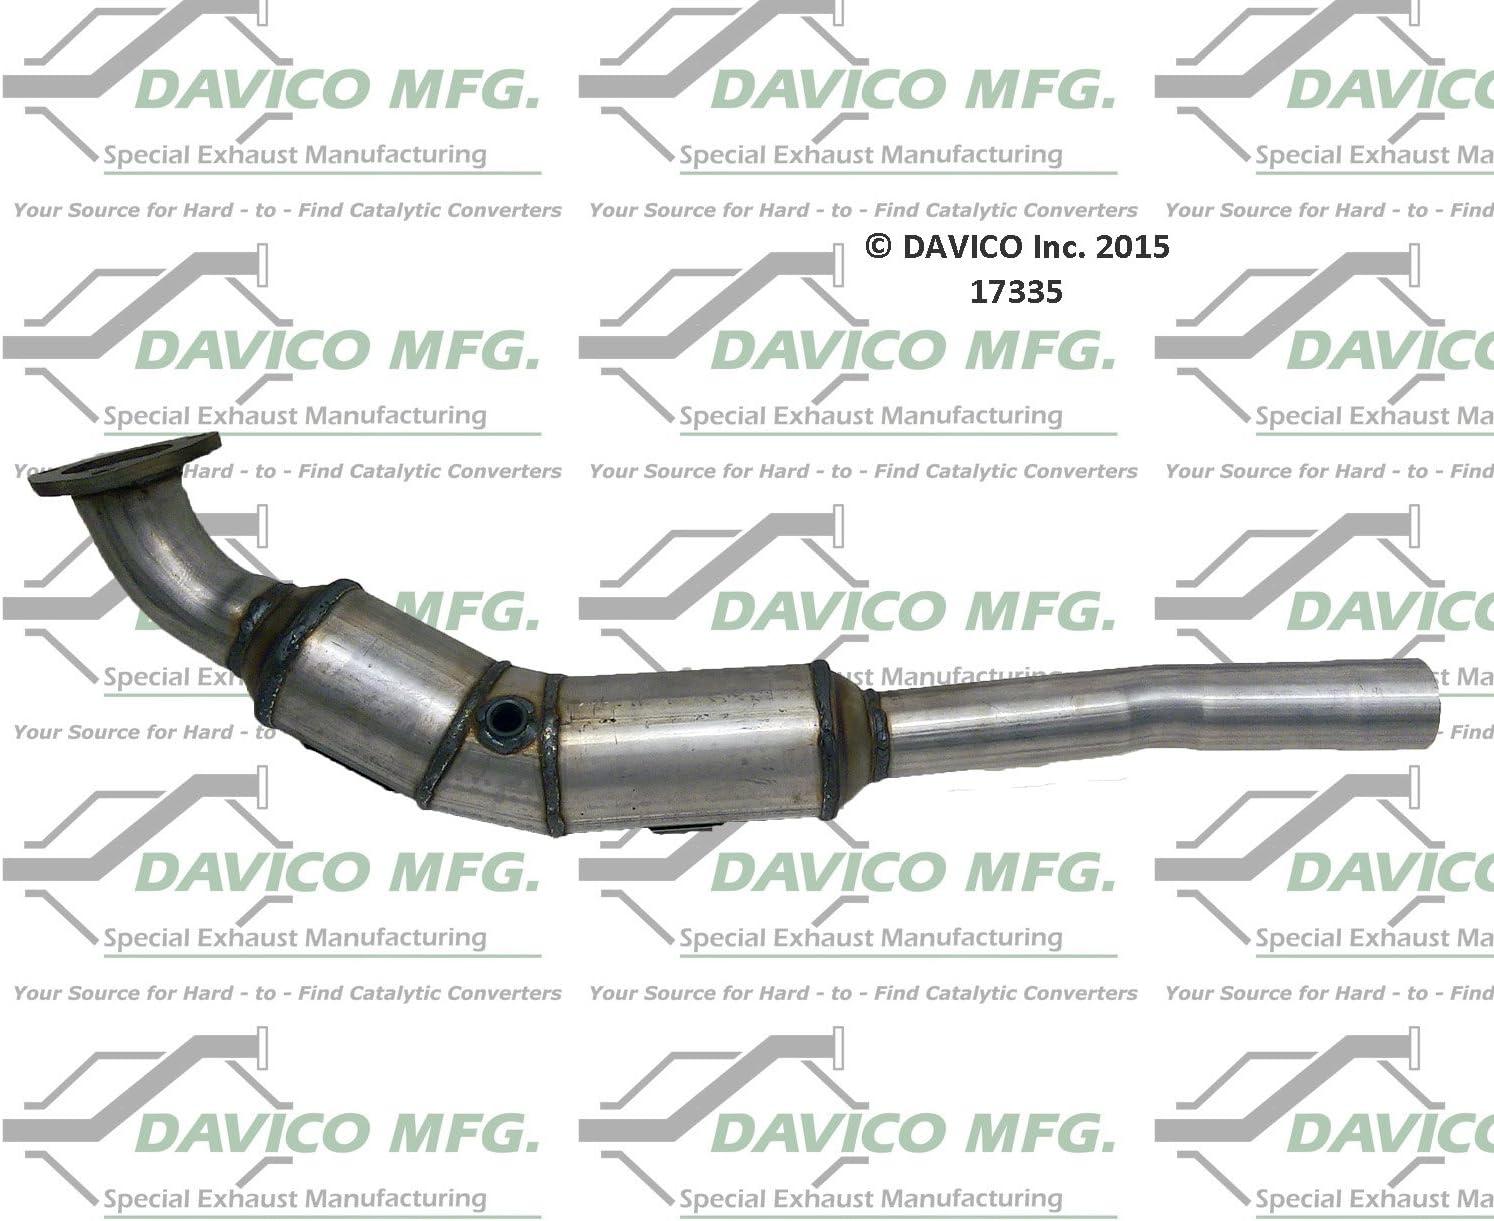 Davico Store 17335 Mesa Mall Catalytic Pack Converter 1